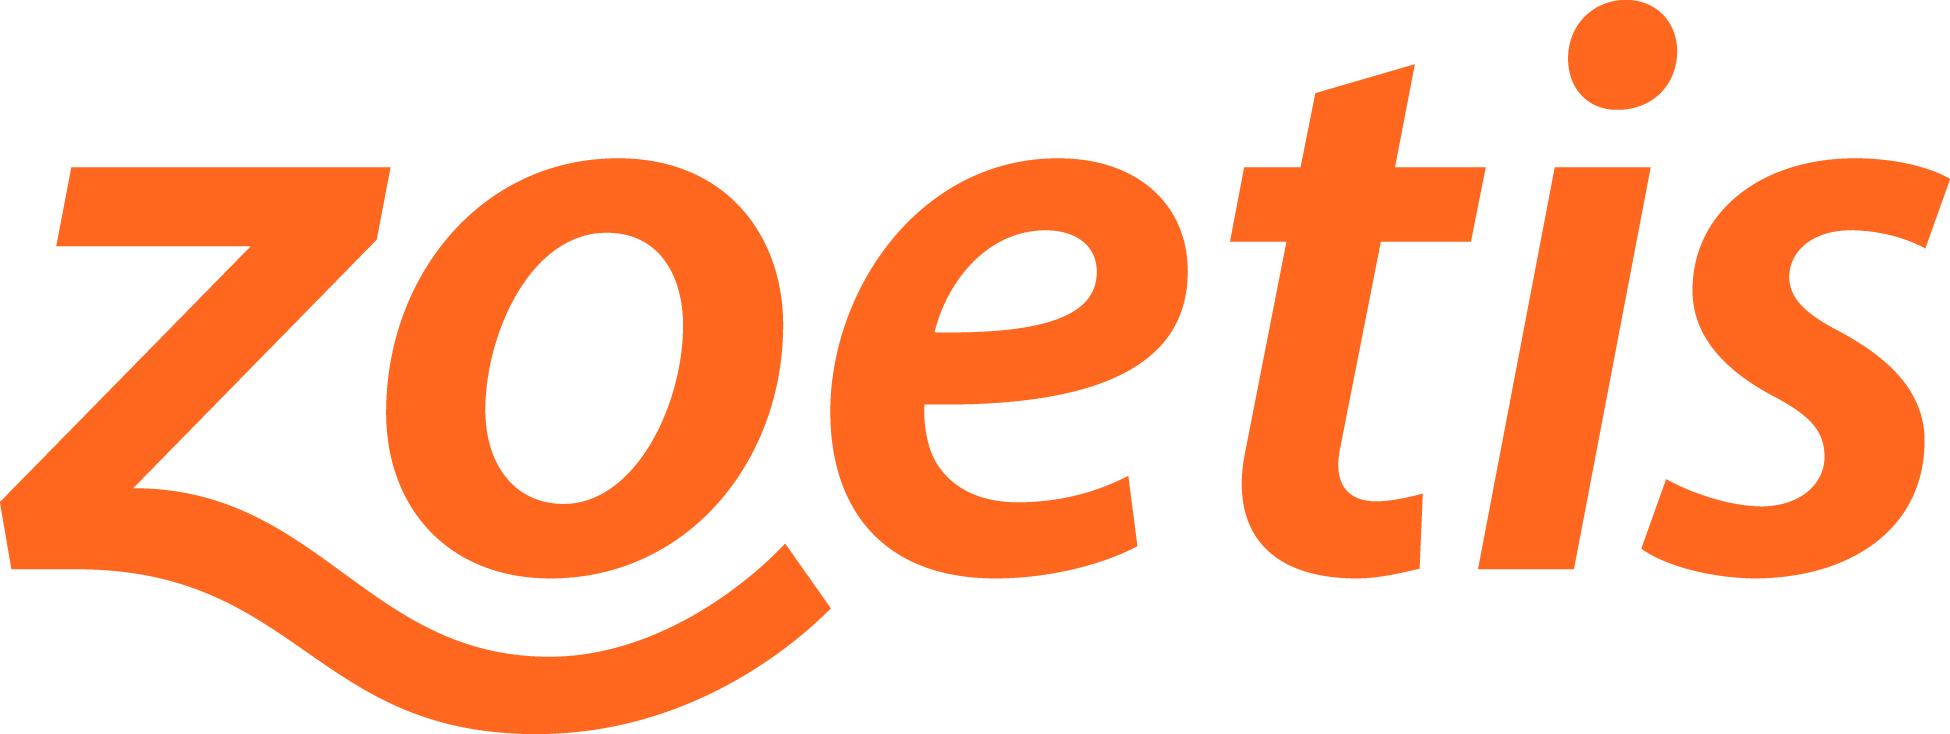 Zoetis_logo_rgb.jpg